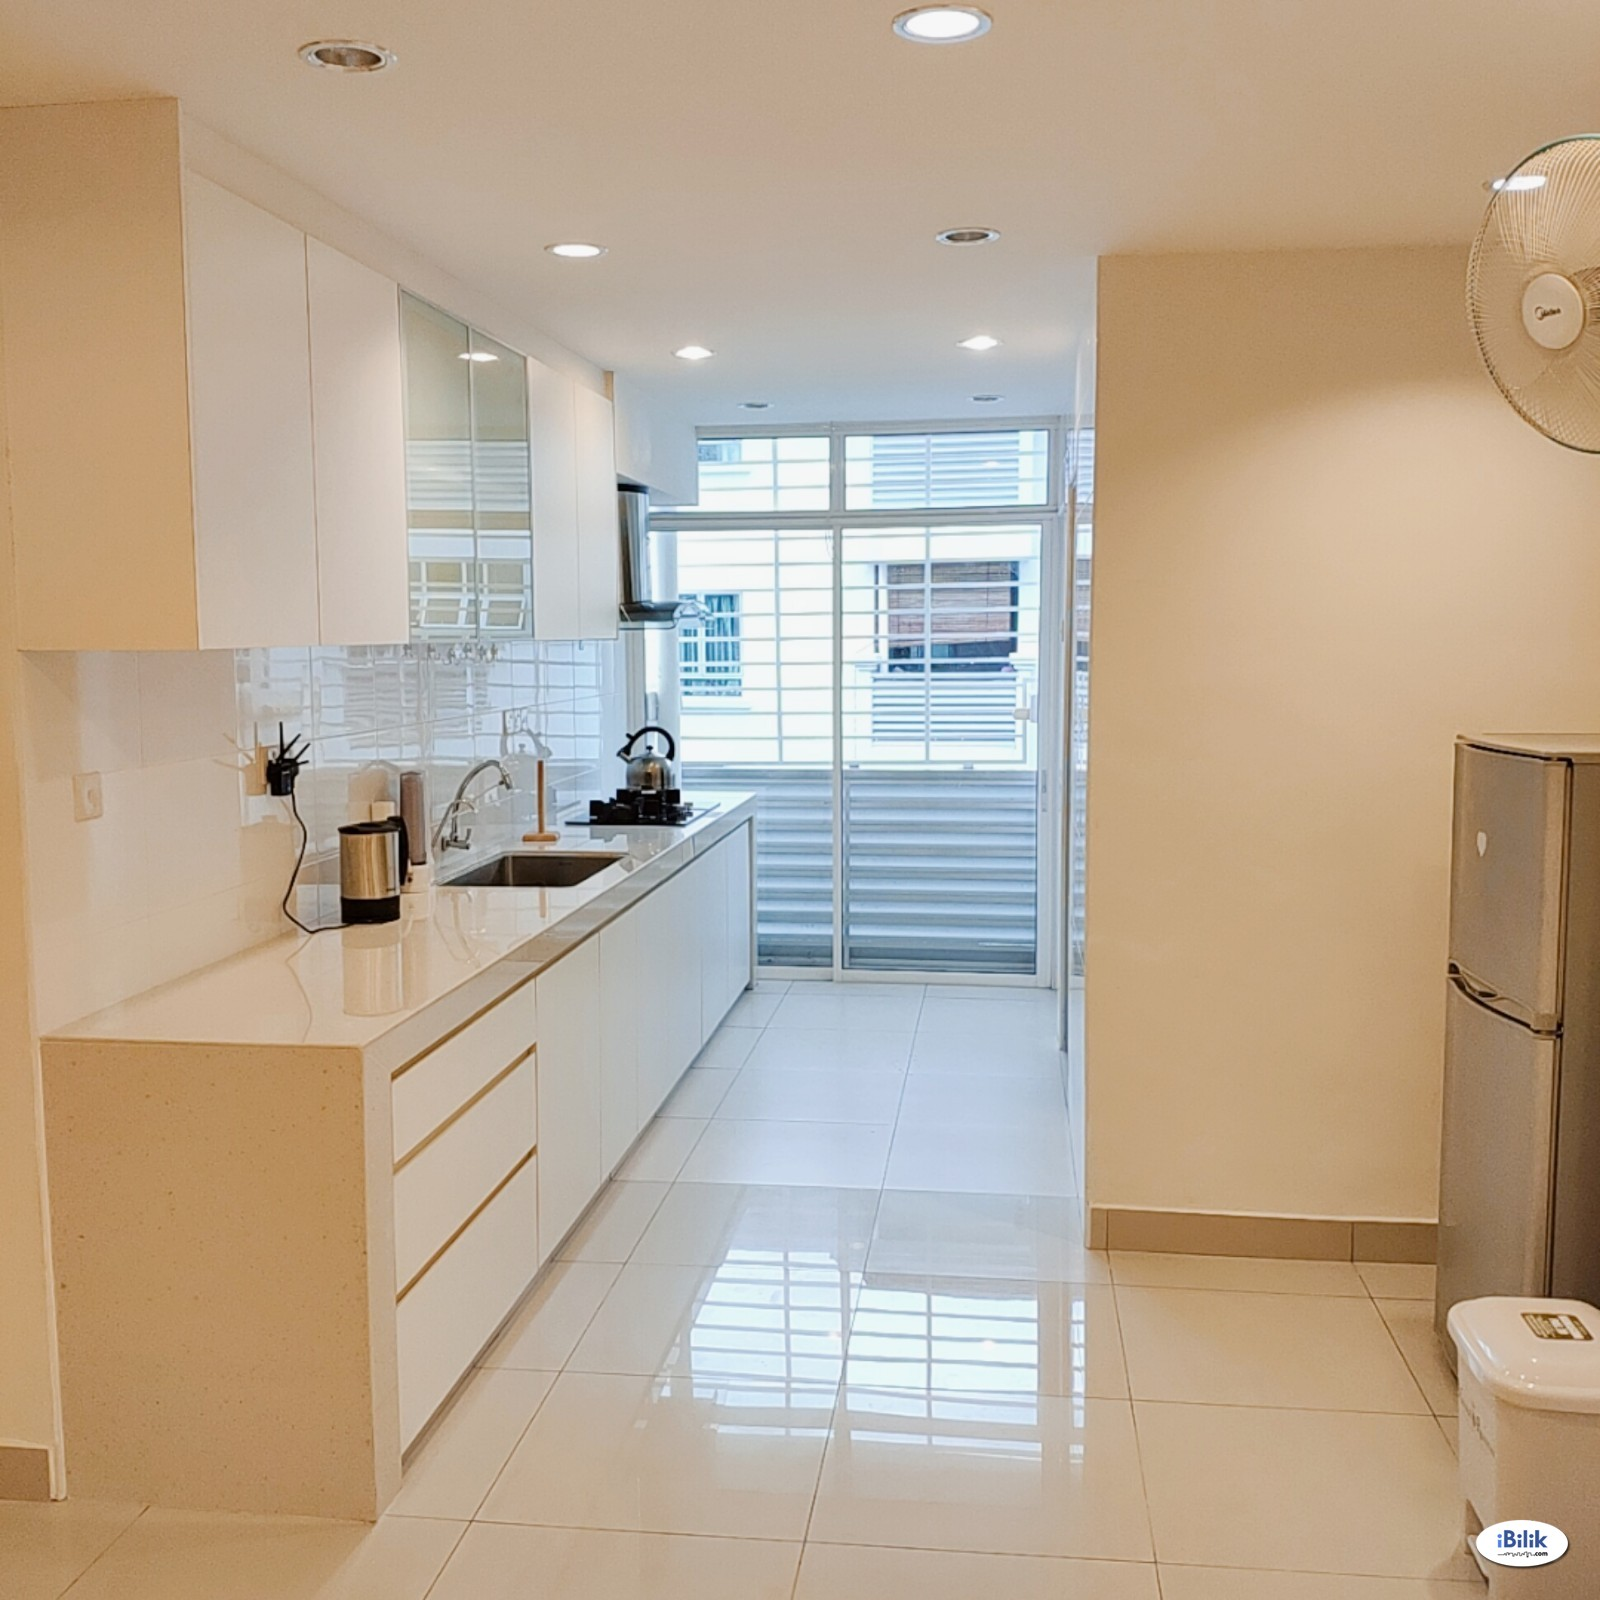 Nice Clean Quiet Spacious Middle Room near Kinrara, Bukit Jalil, TPM, The Mines, Serdang, UPM, Equine Park, Bdr. Putra Permai, IOI City Mall